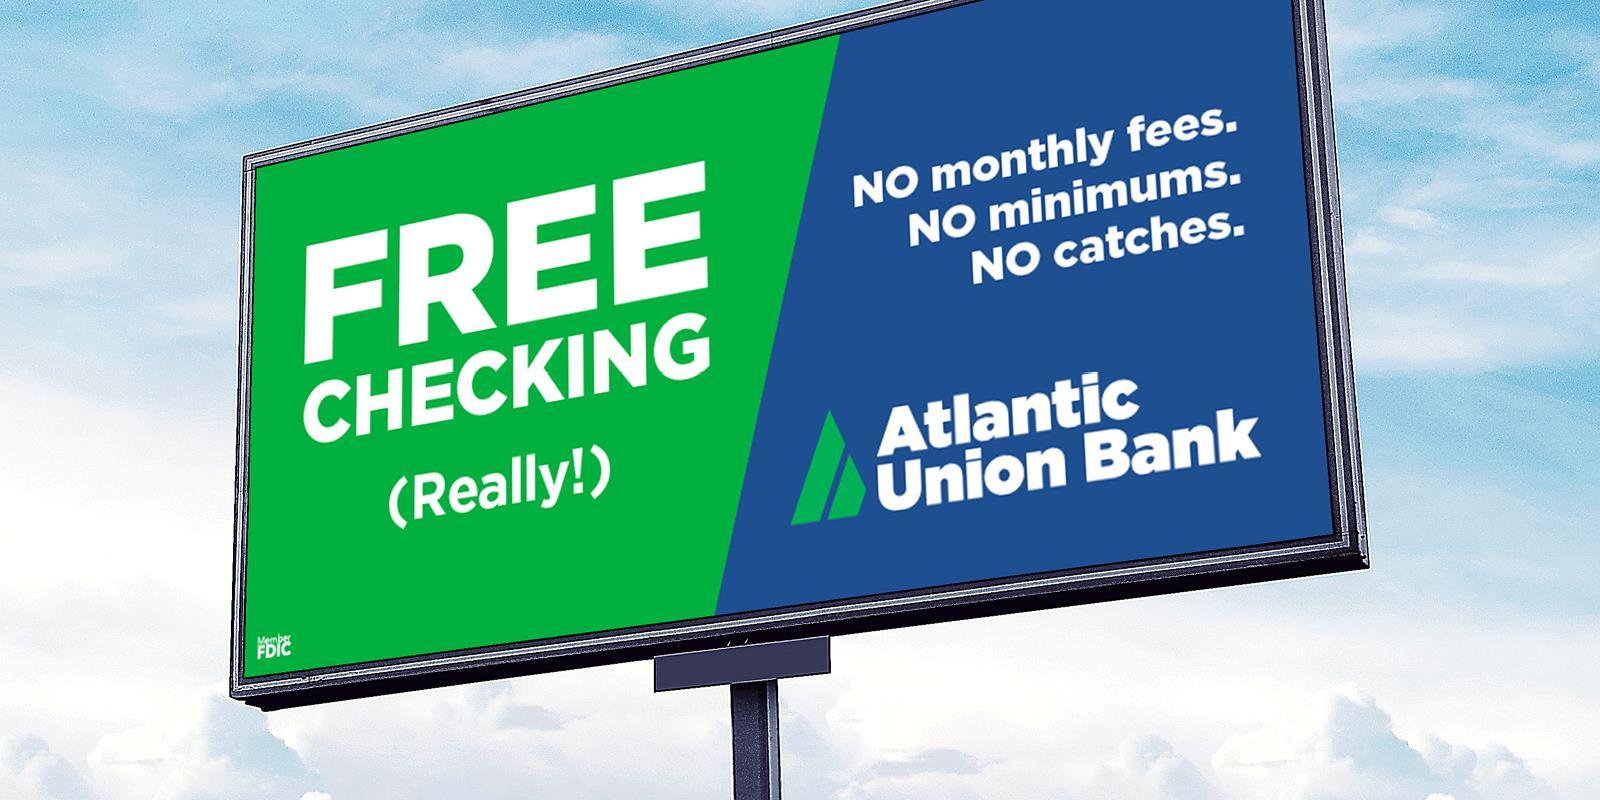 Atlantic Union Bank Case Study